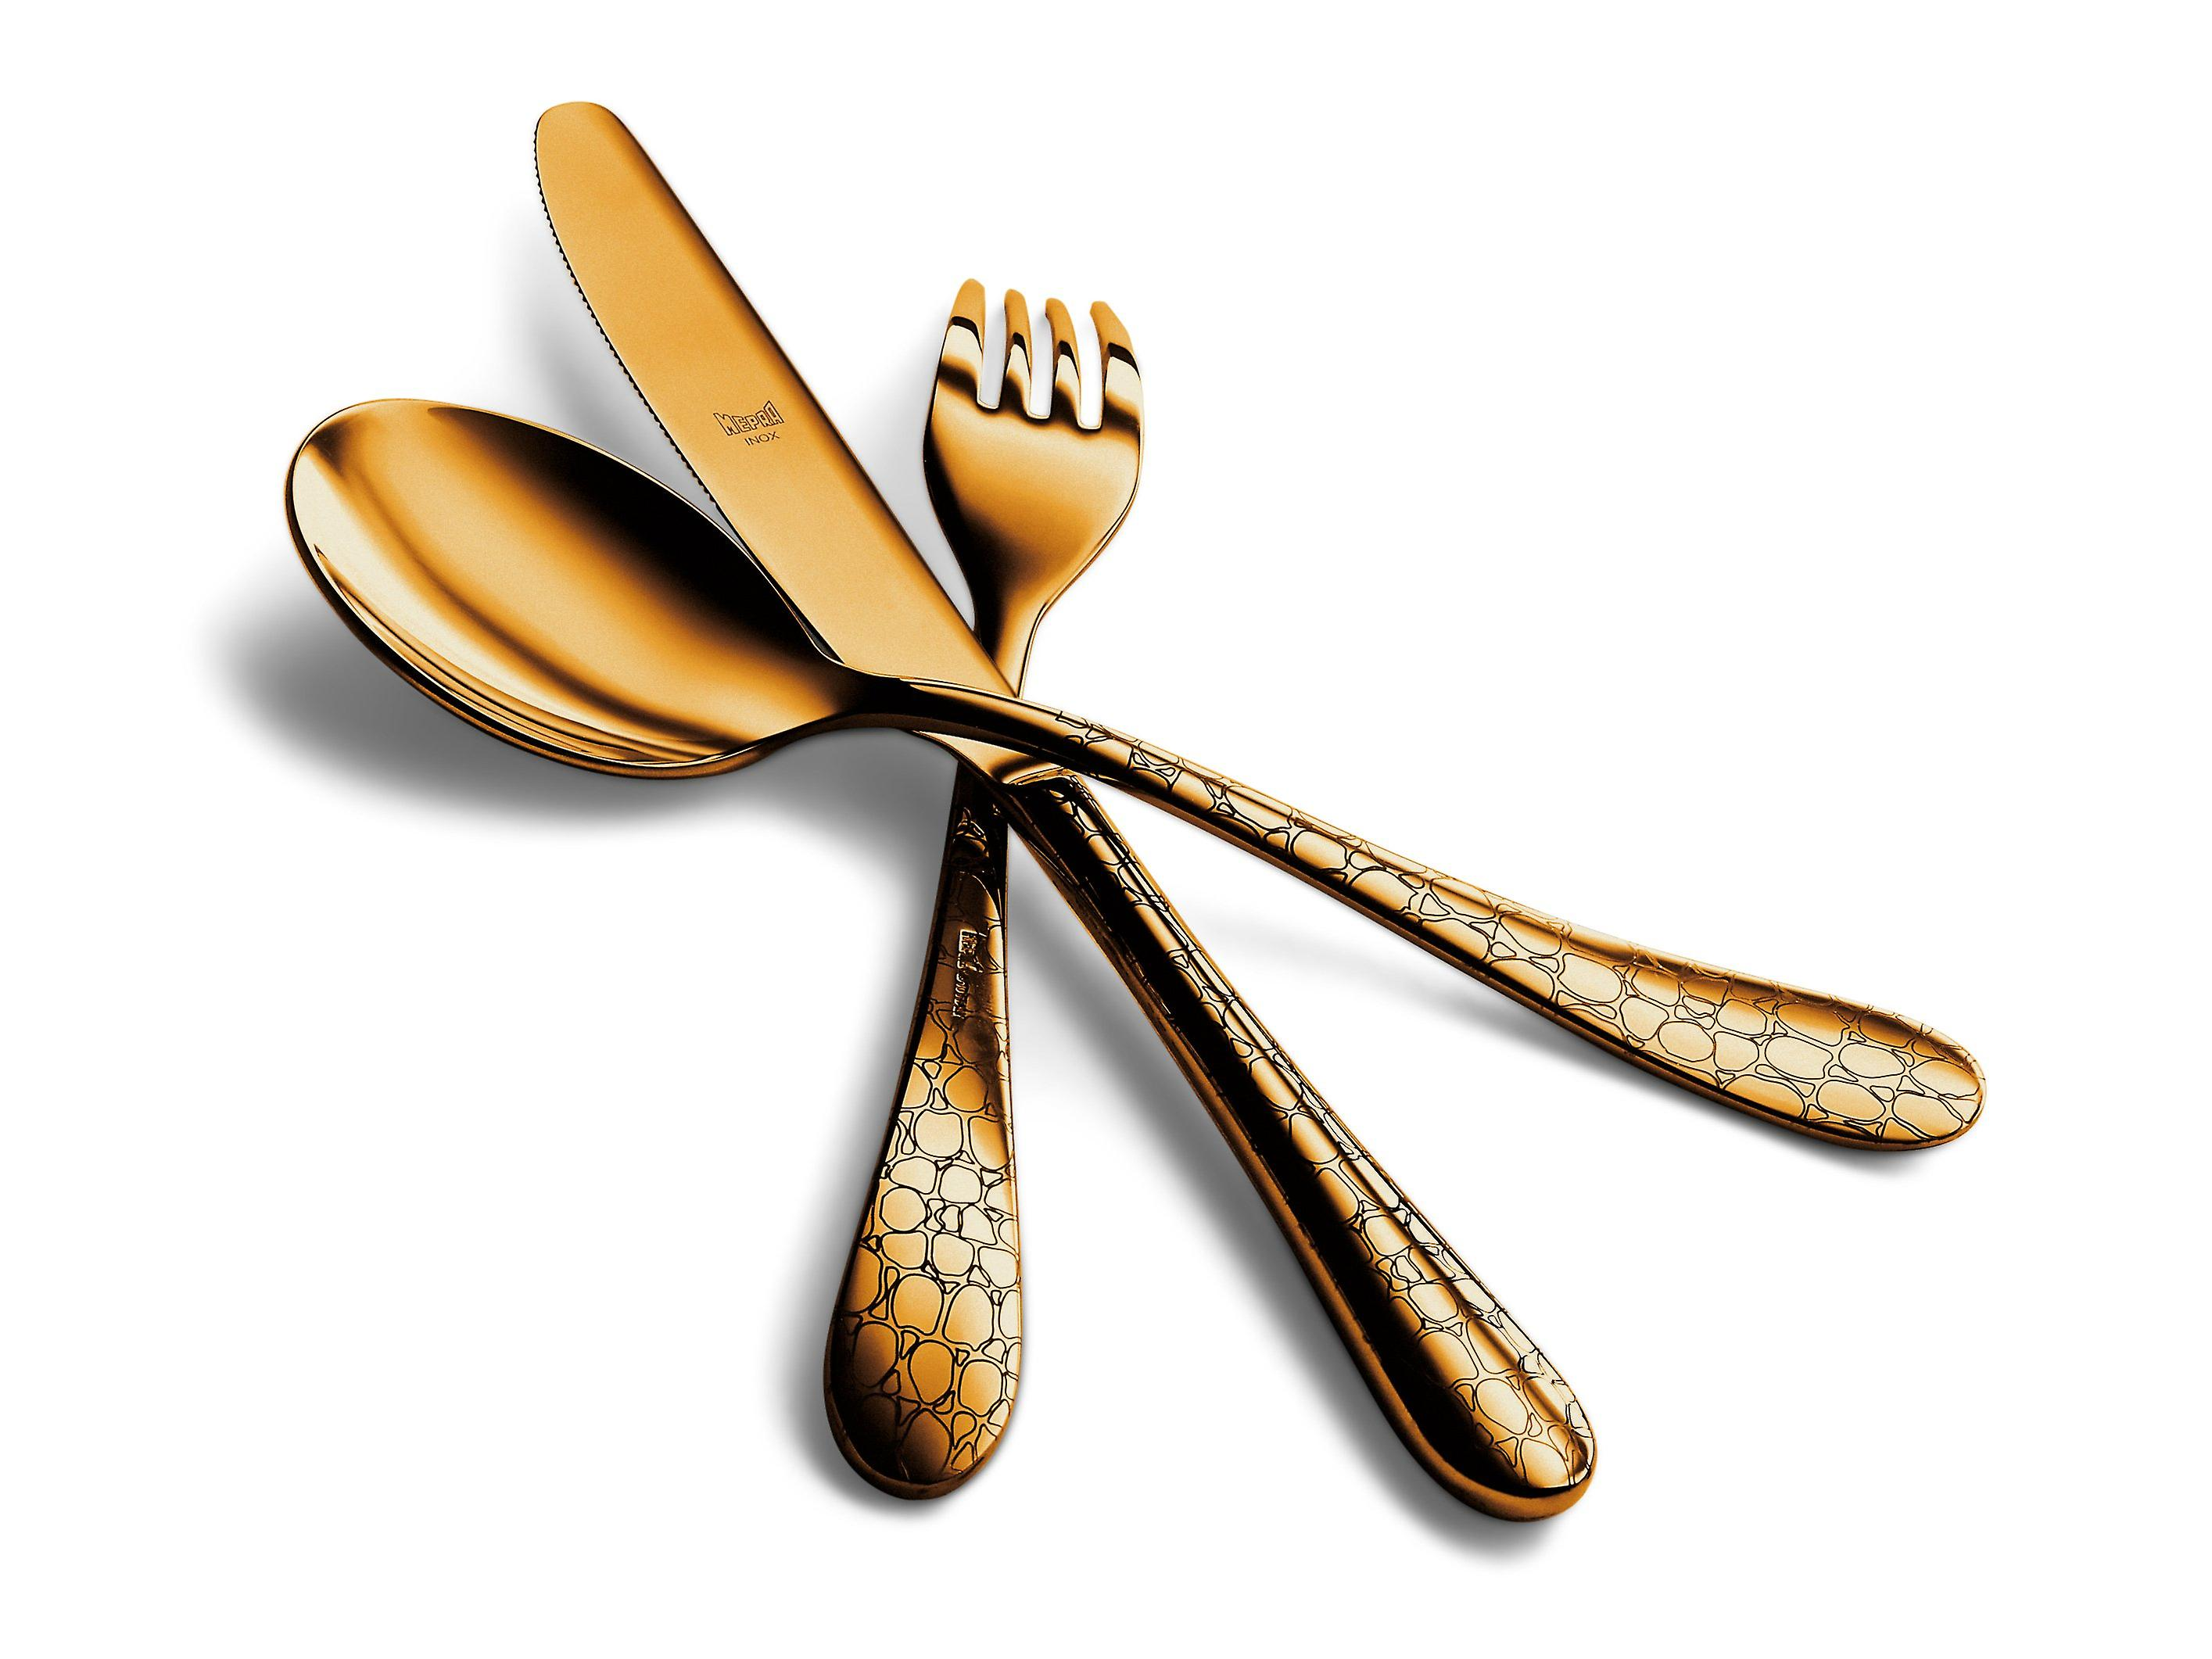 Mepra Coccodrillo Oro 5 pcs flatware set